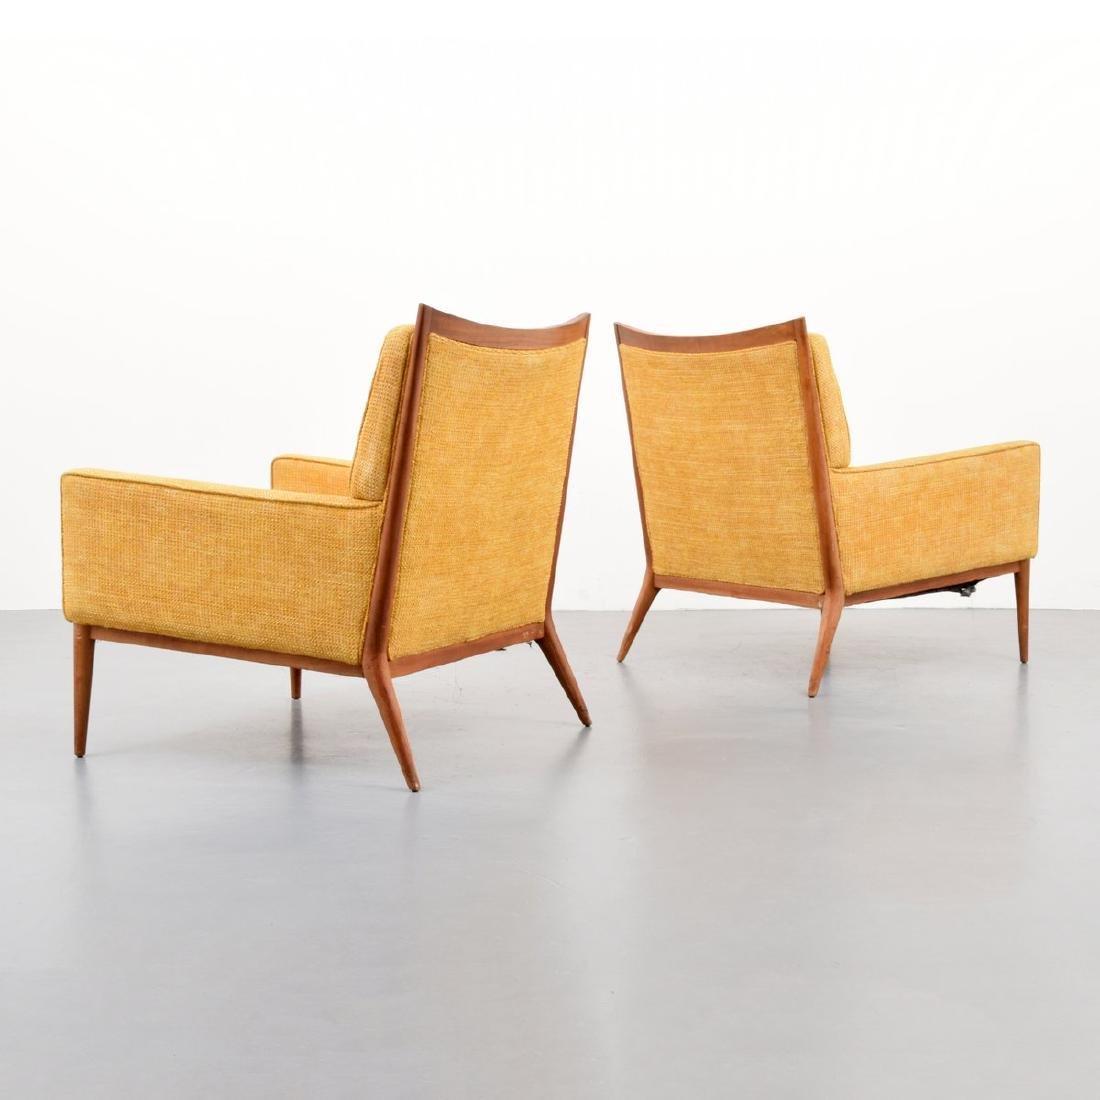 Pair of Paul McCobb Lounge Chairs - 10